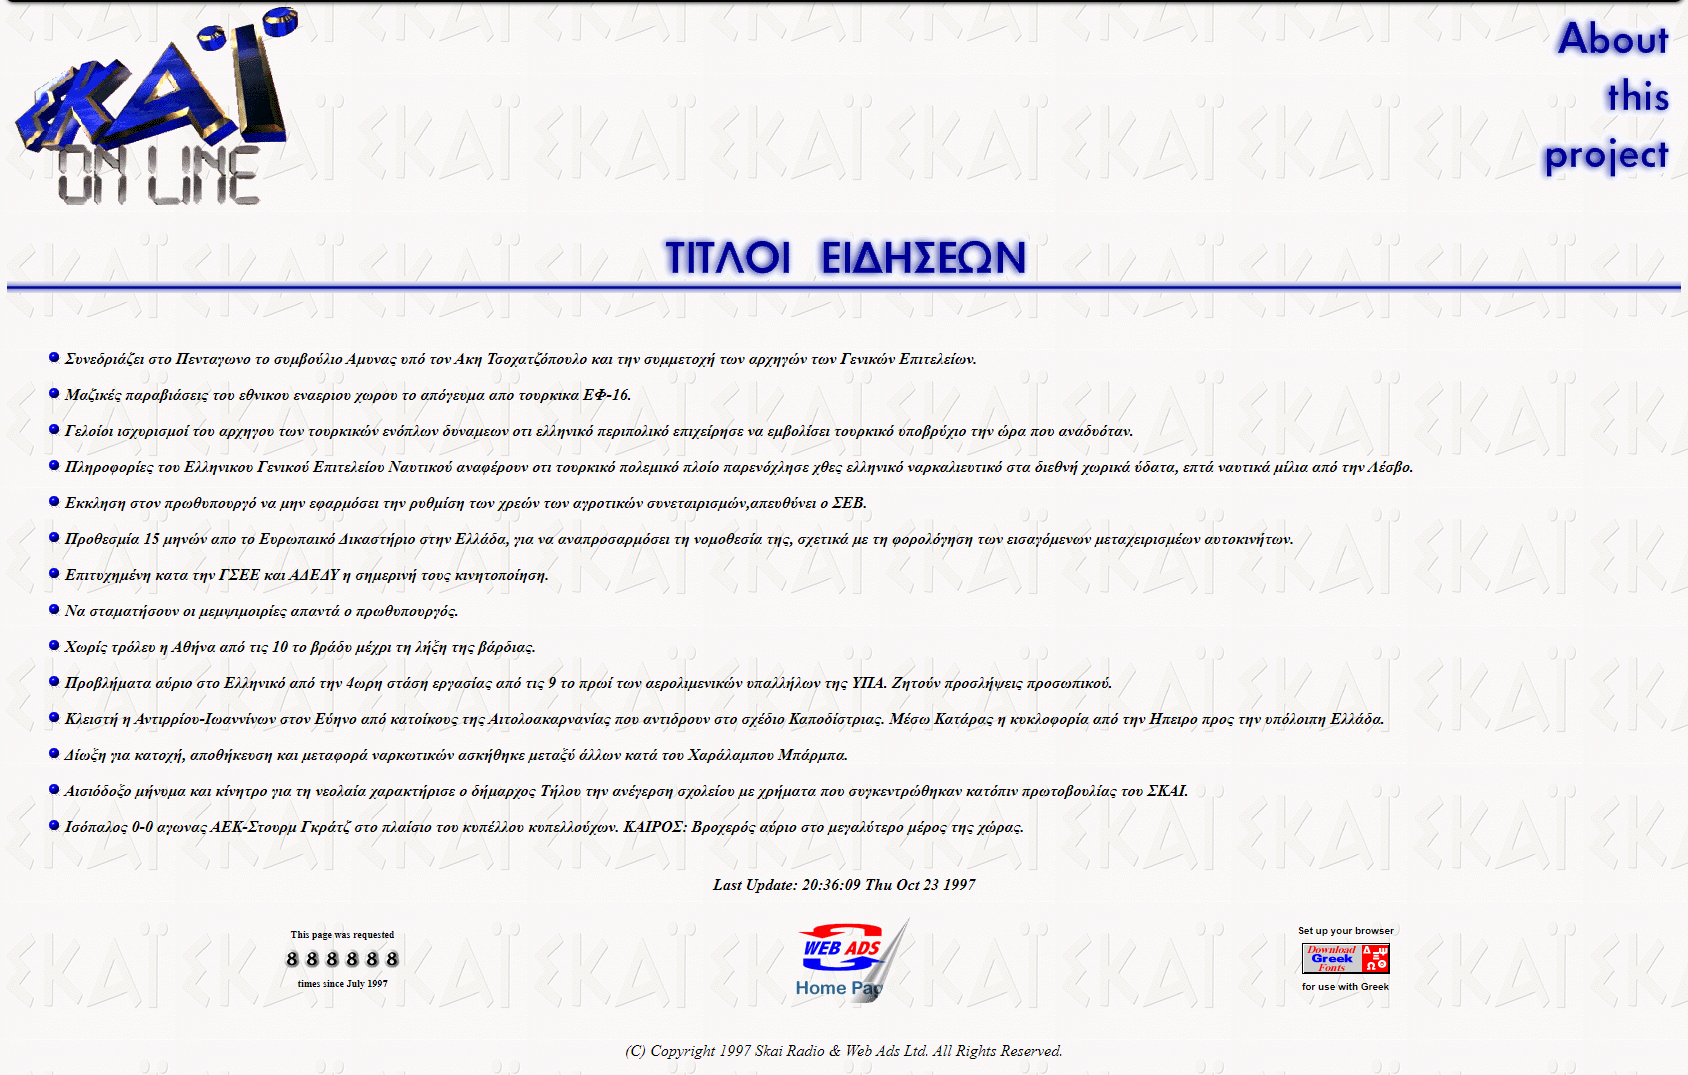 skai.gr: Πρώτη σελίδα ελληνικού ΜΜΕ με ημίωρη ενημέρωση